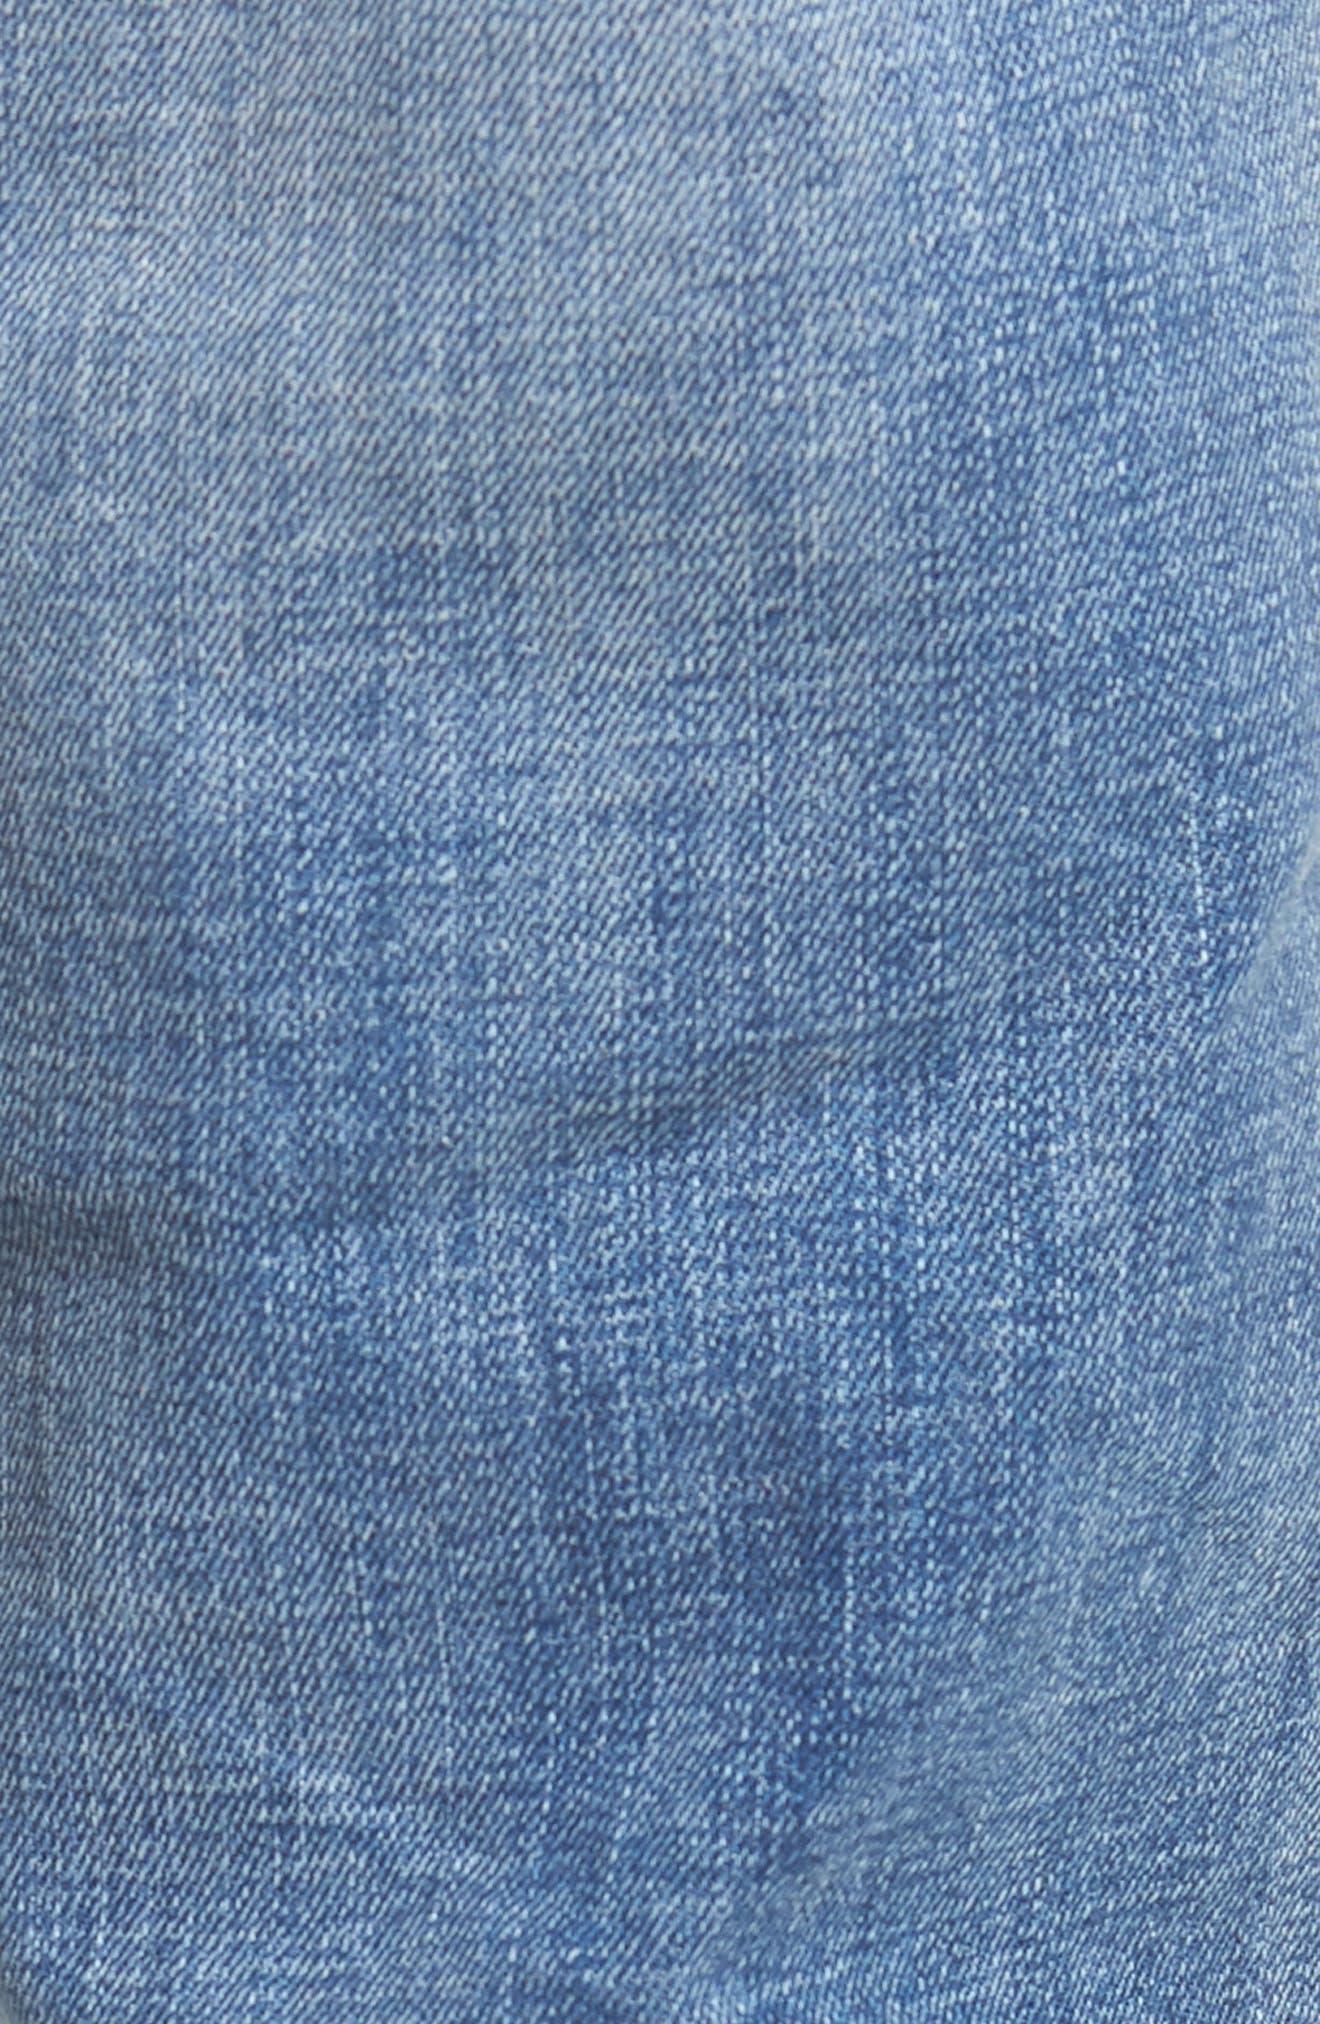 Blake Slim Fit Jeans,                             Alternate thumbnail 5, color,                             421